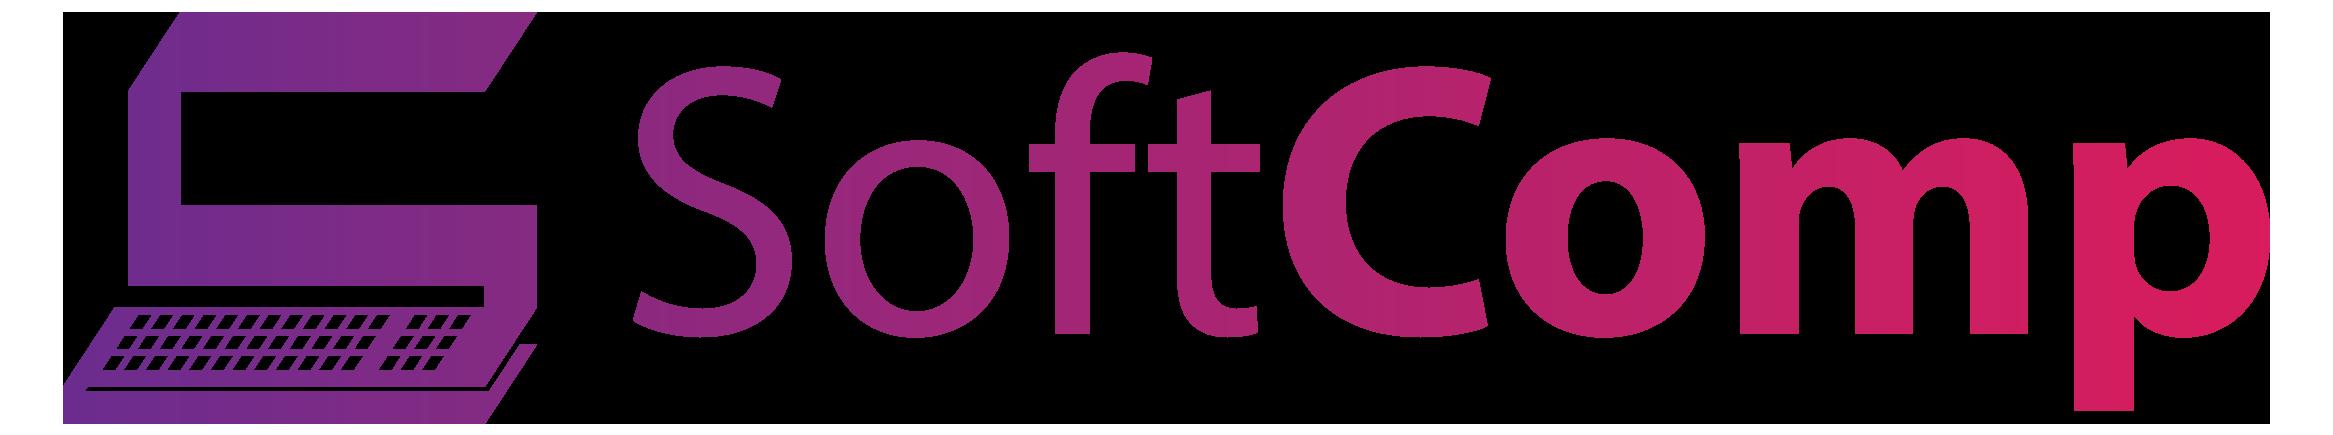 SoftComp logo